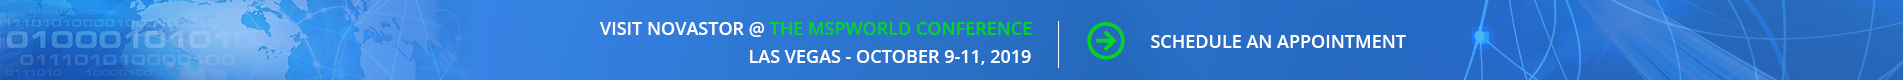 MSP-Conference-las-vegas